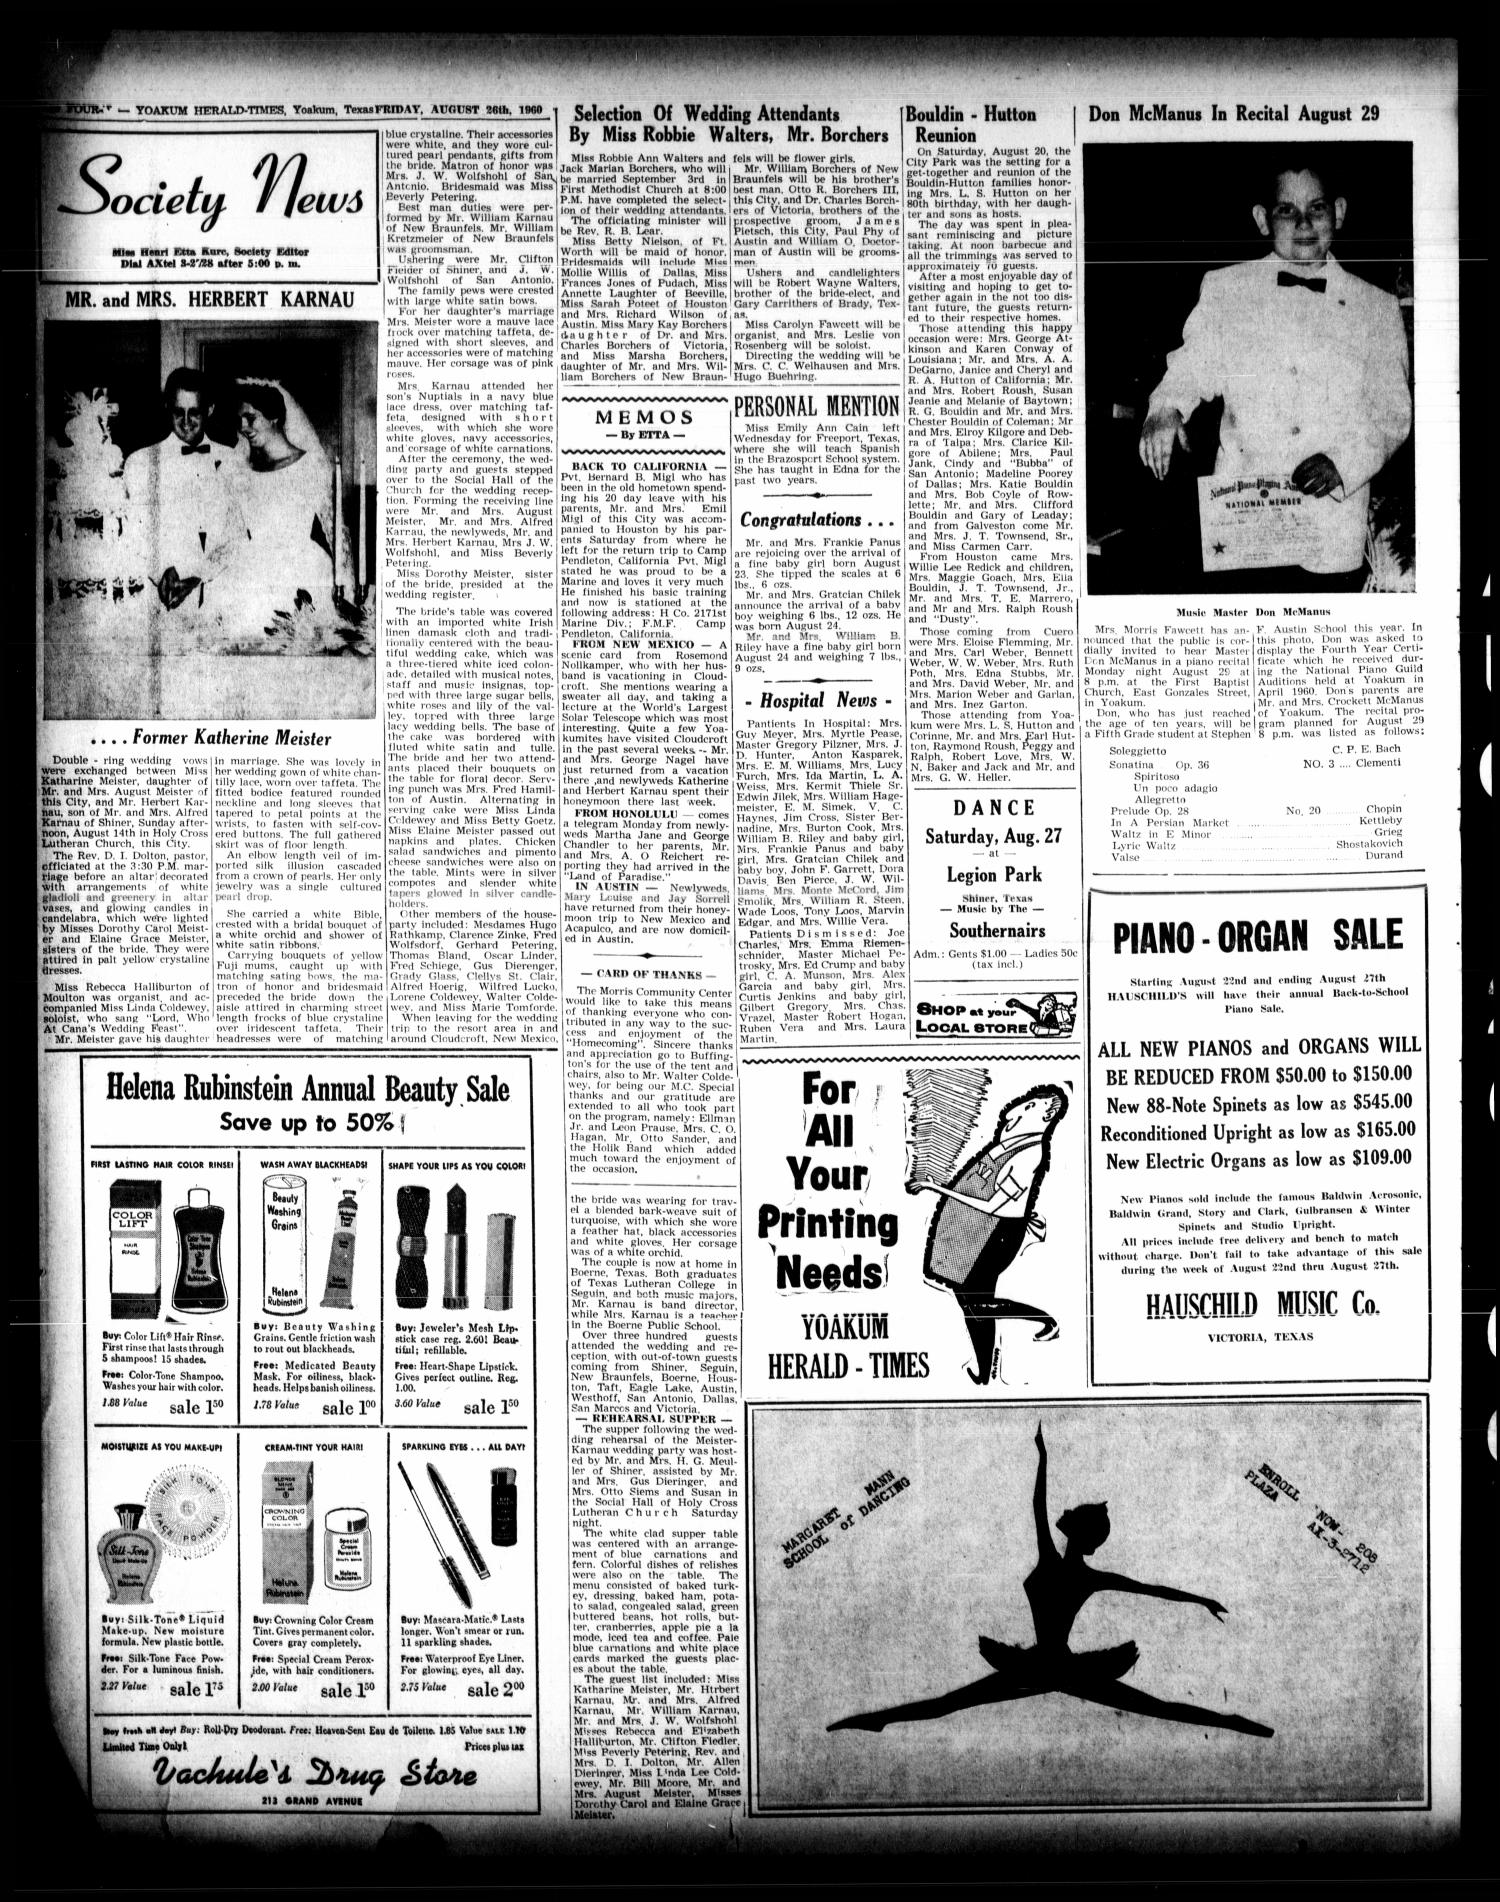 Yoakum Herald-Times (Yoakum, Tex ), Vol  64, No  68, Ed  1